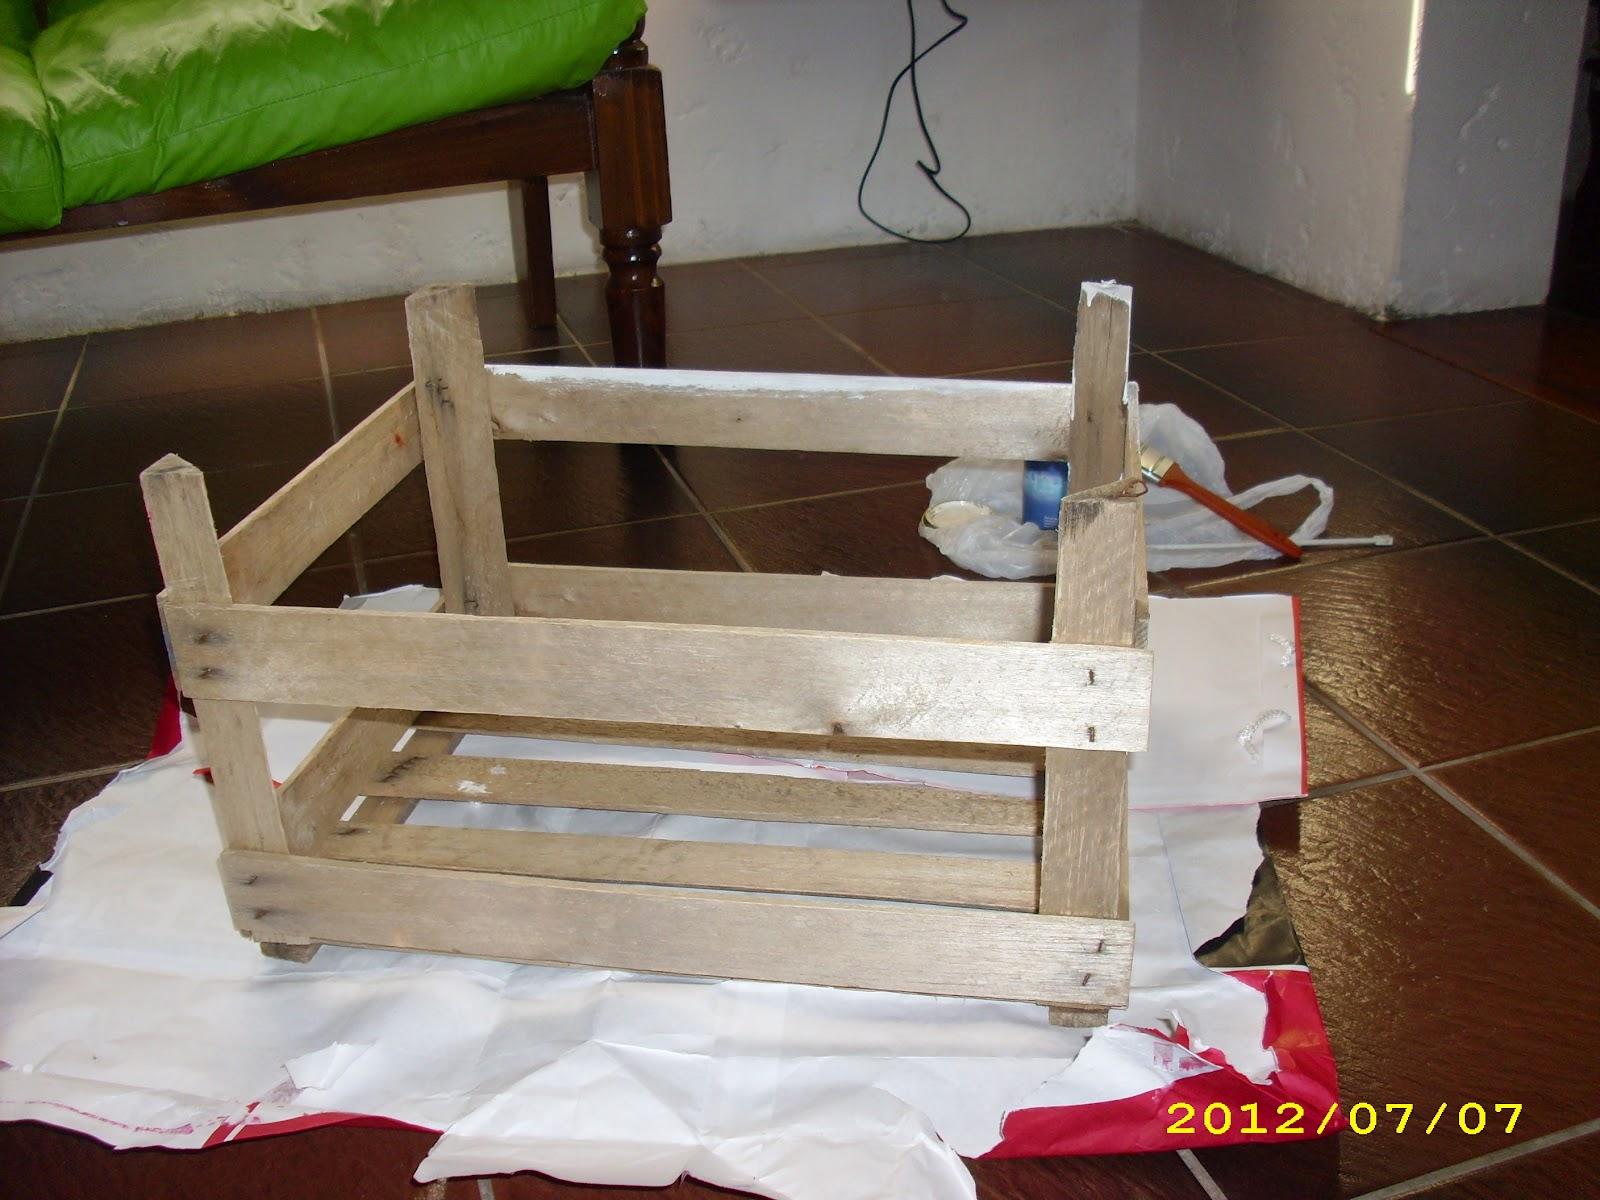 El taller de sof a reciclaje de un caj n de verduras - Cajon para guardar juguetes ...